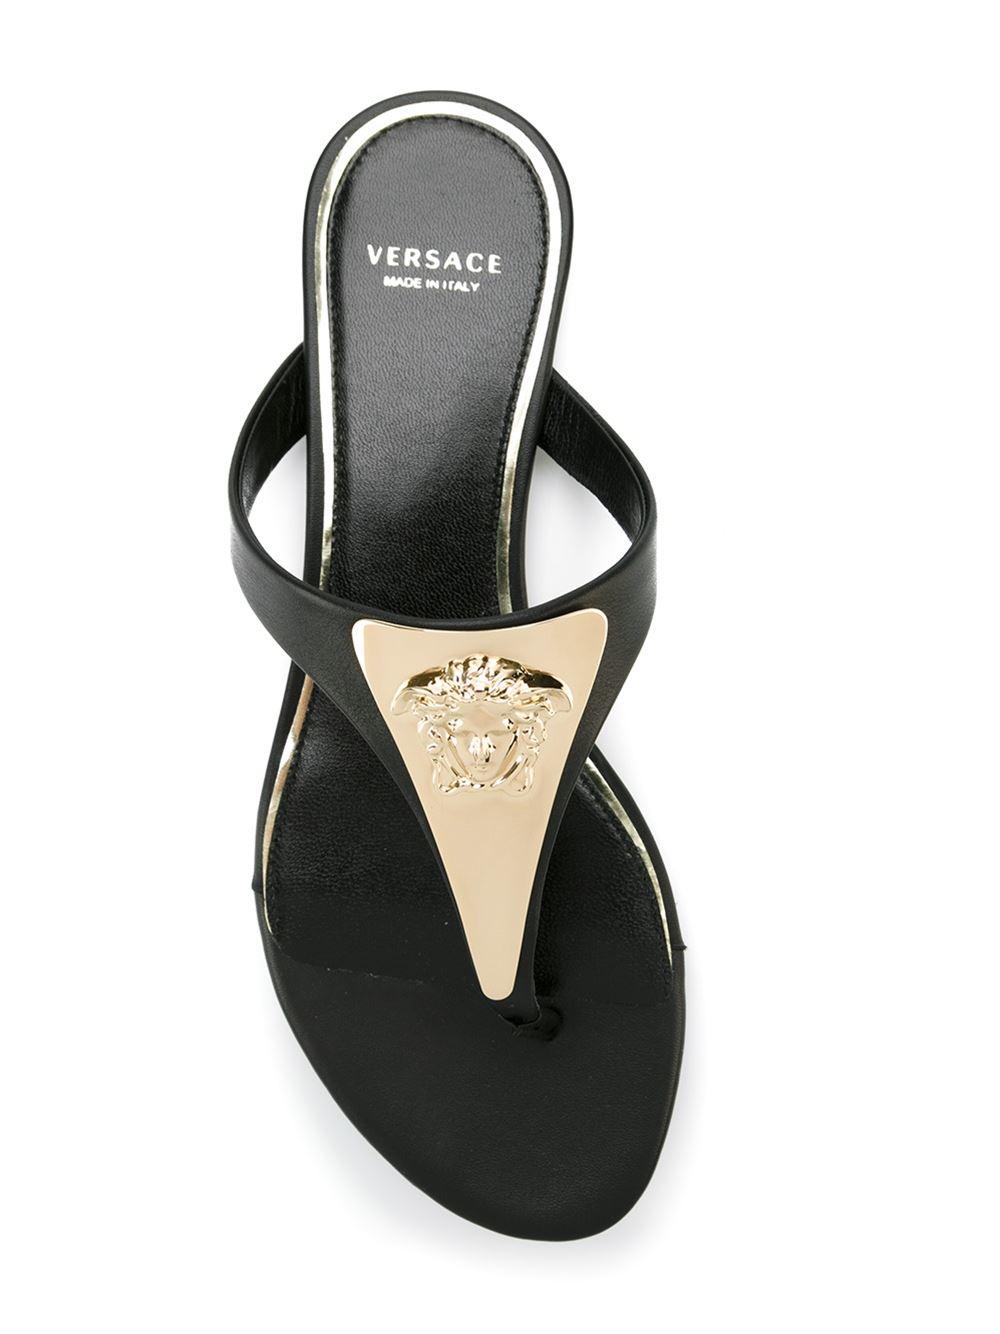 6680ab09b656c Lyst - Versace  medusa Palazzo  Thong Sandals in Black